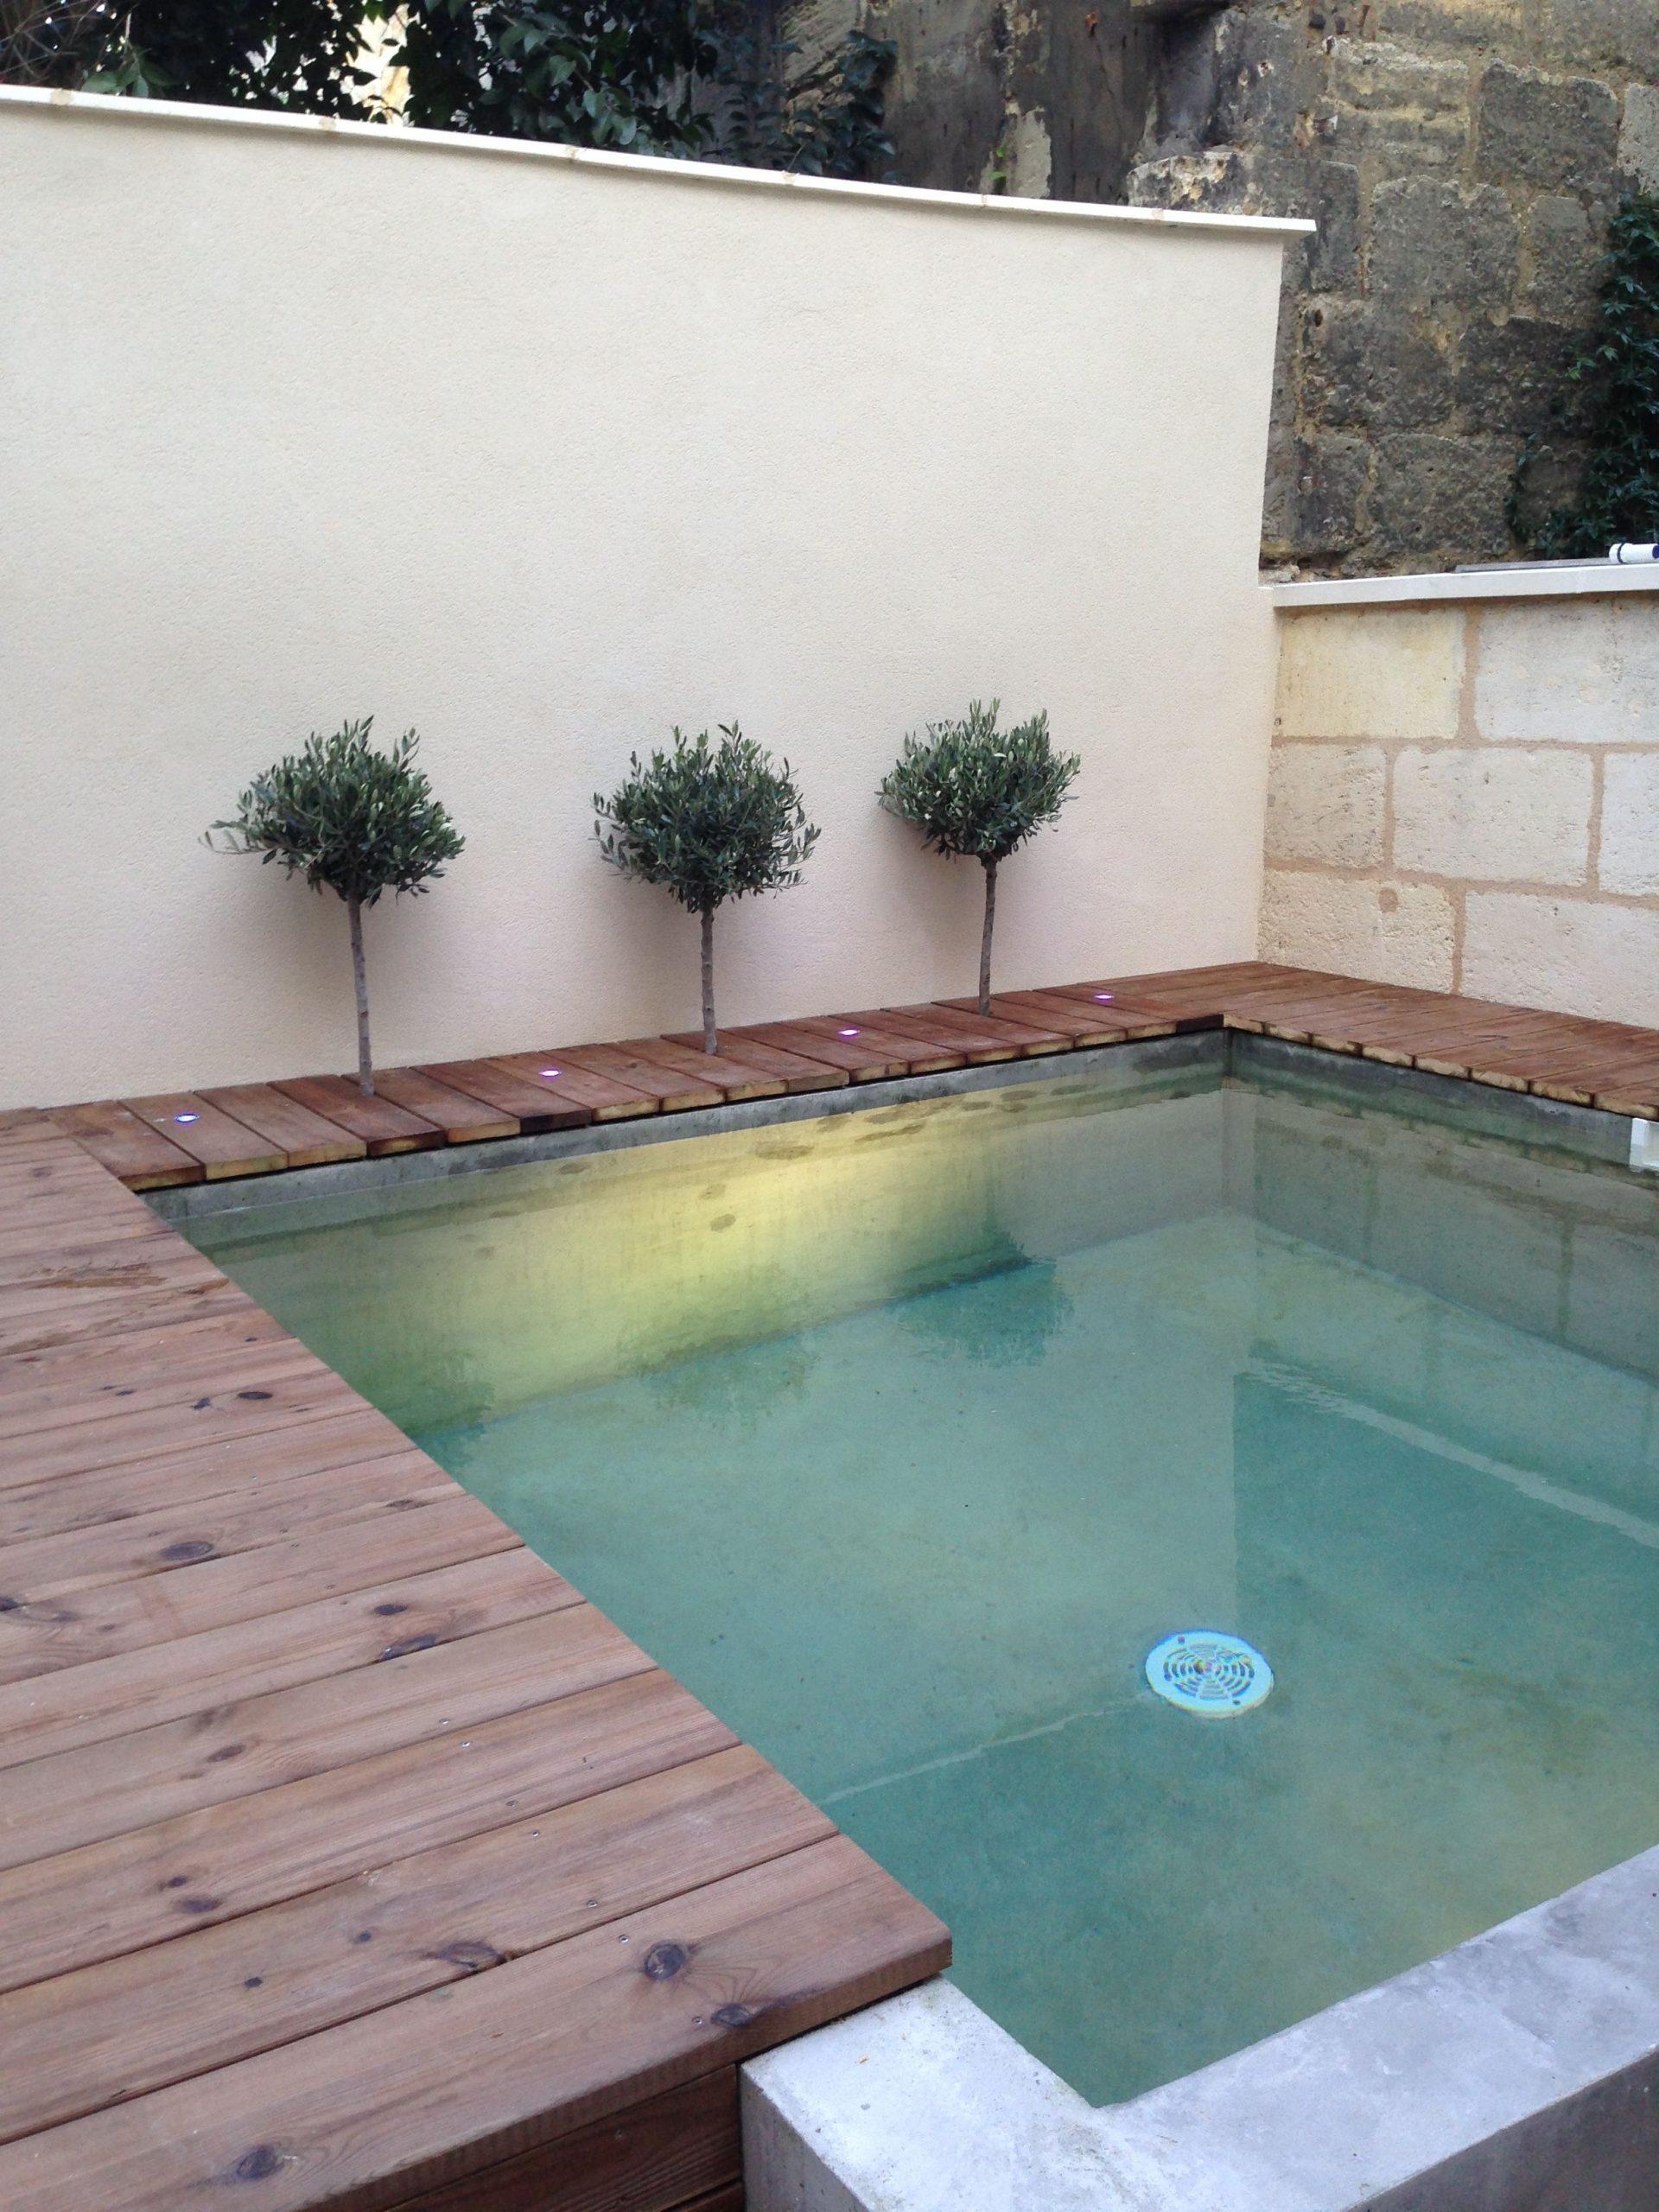 Small Pool 3X3 | Small Backyard Pools, Backyard Pool, Small Pool destiné Piscine 3X3